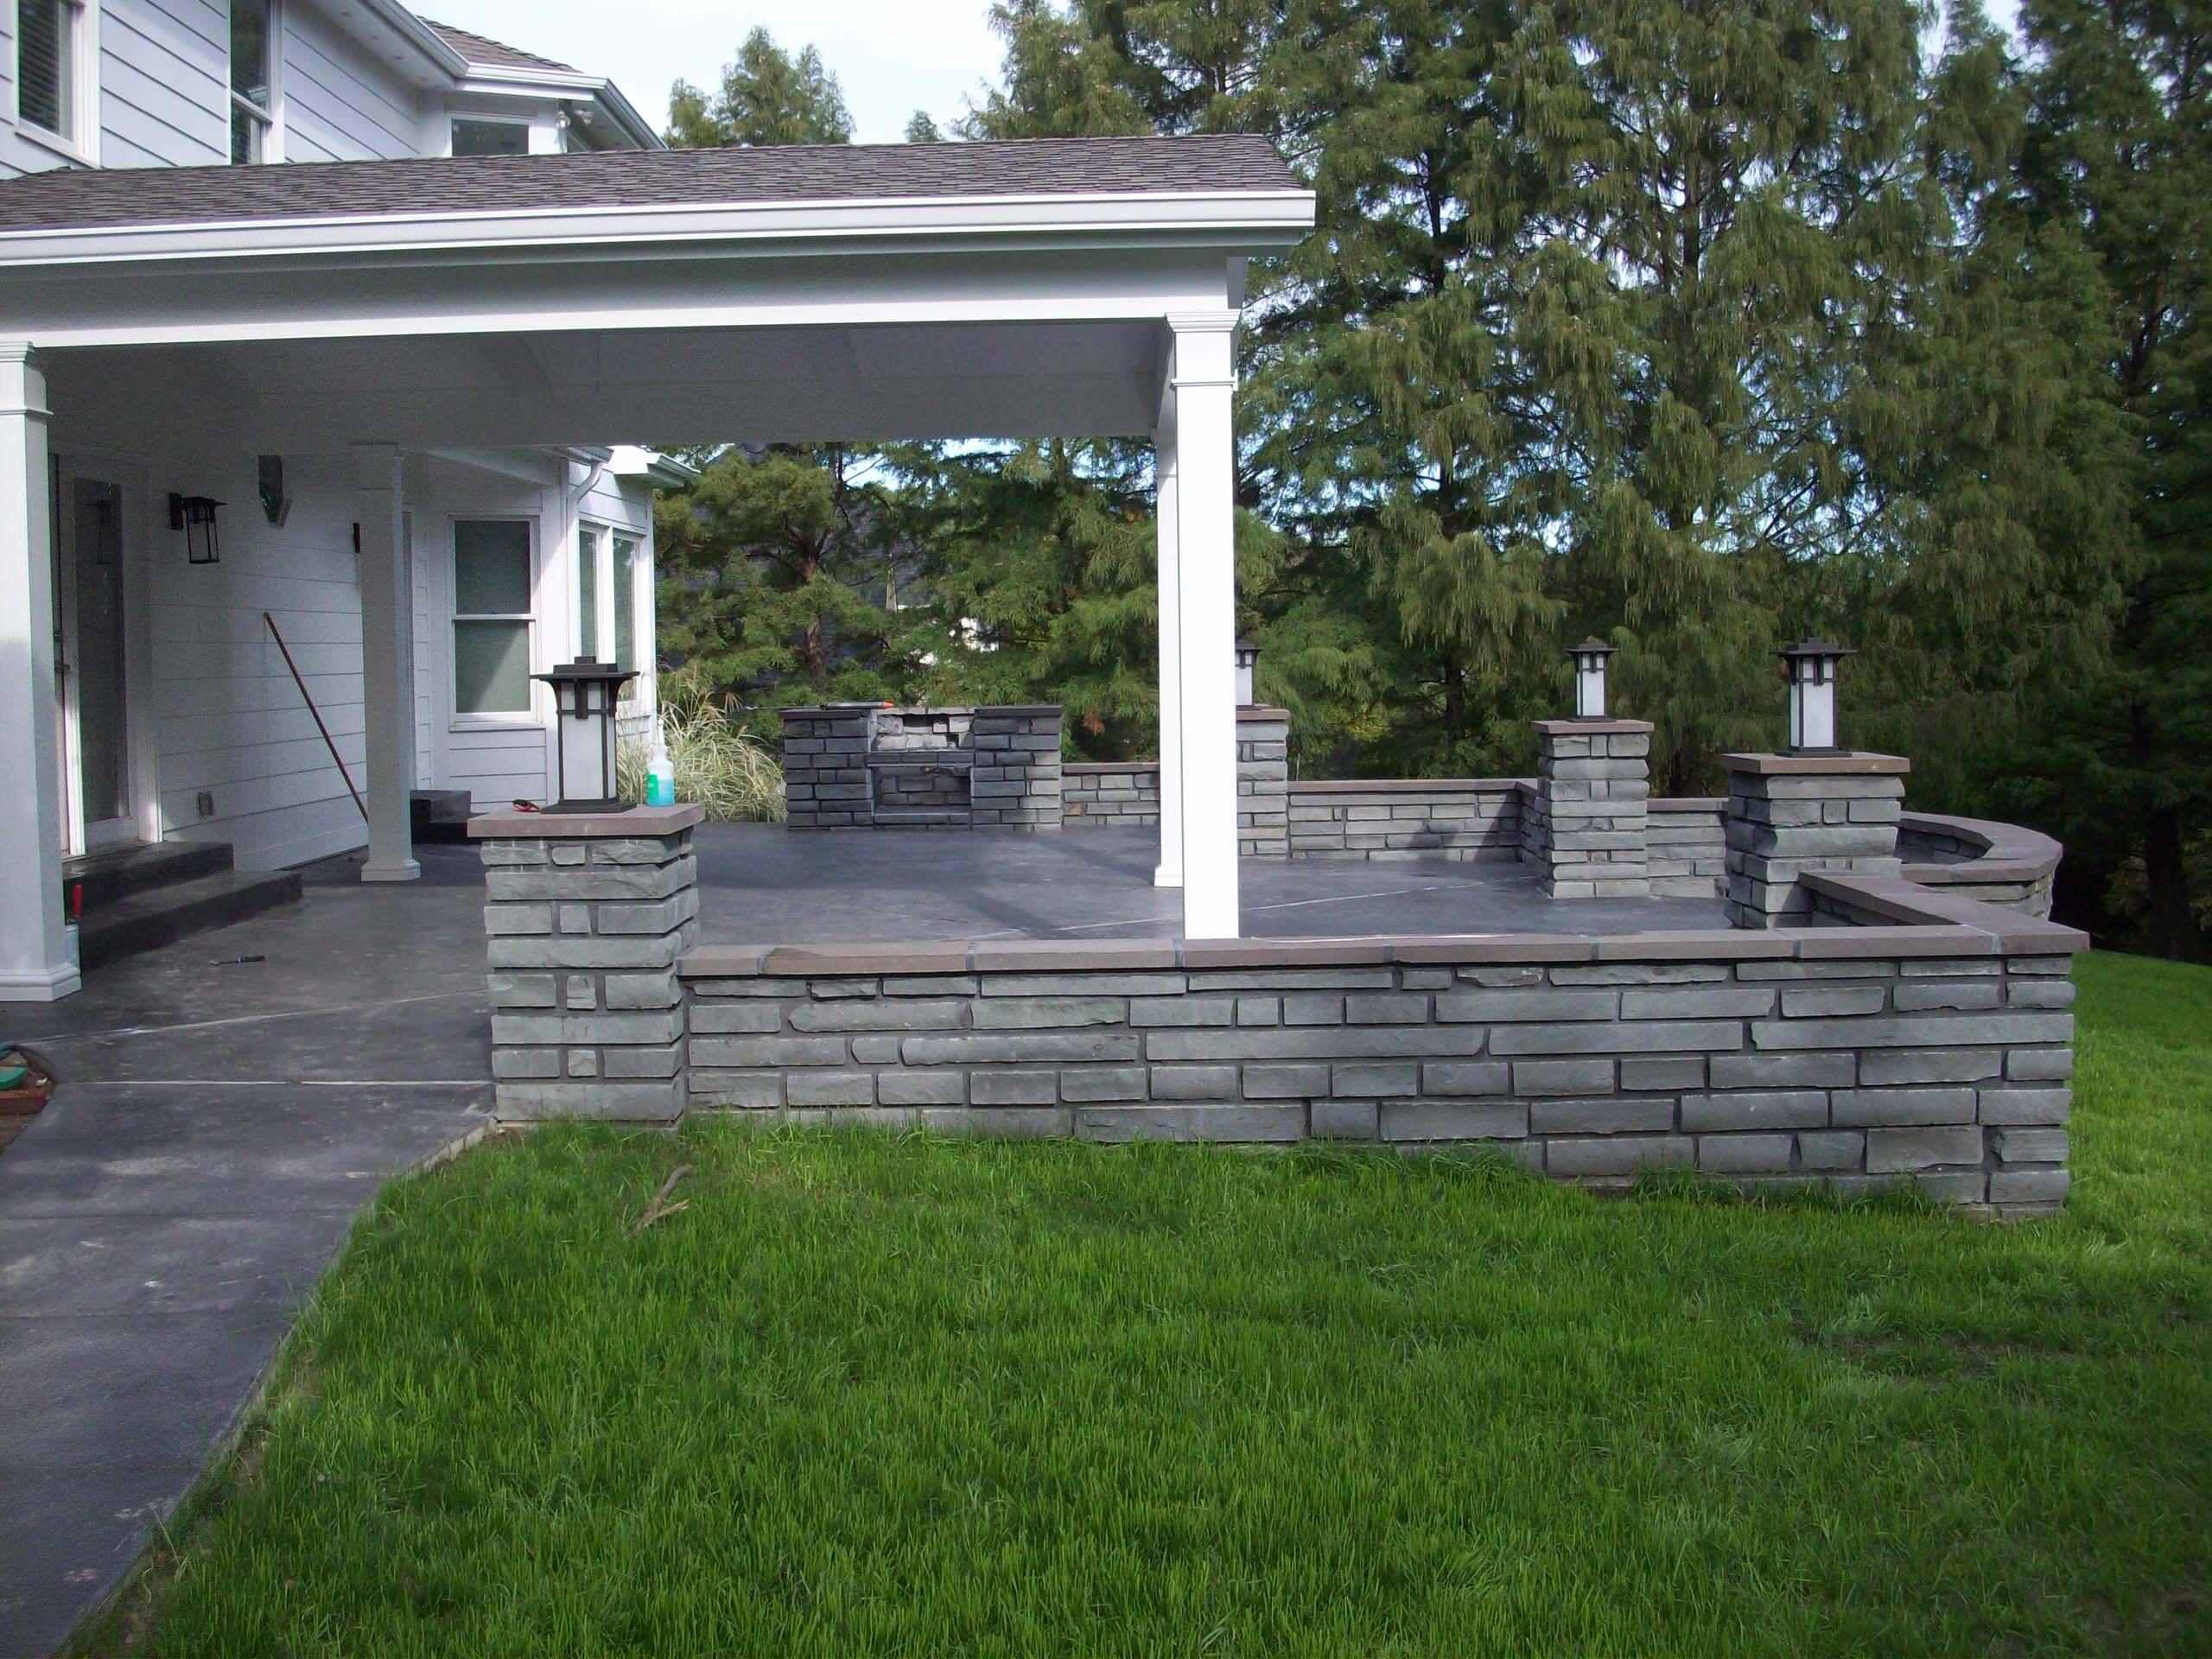 Chesterfield, Missouri Bluestone Masonry Walls with Charcoal Concrete